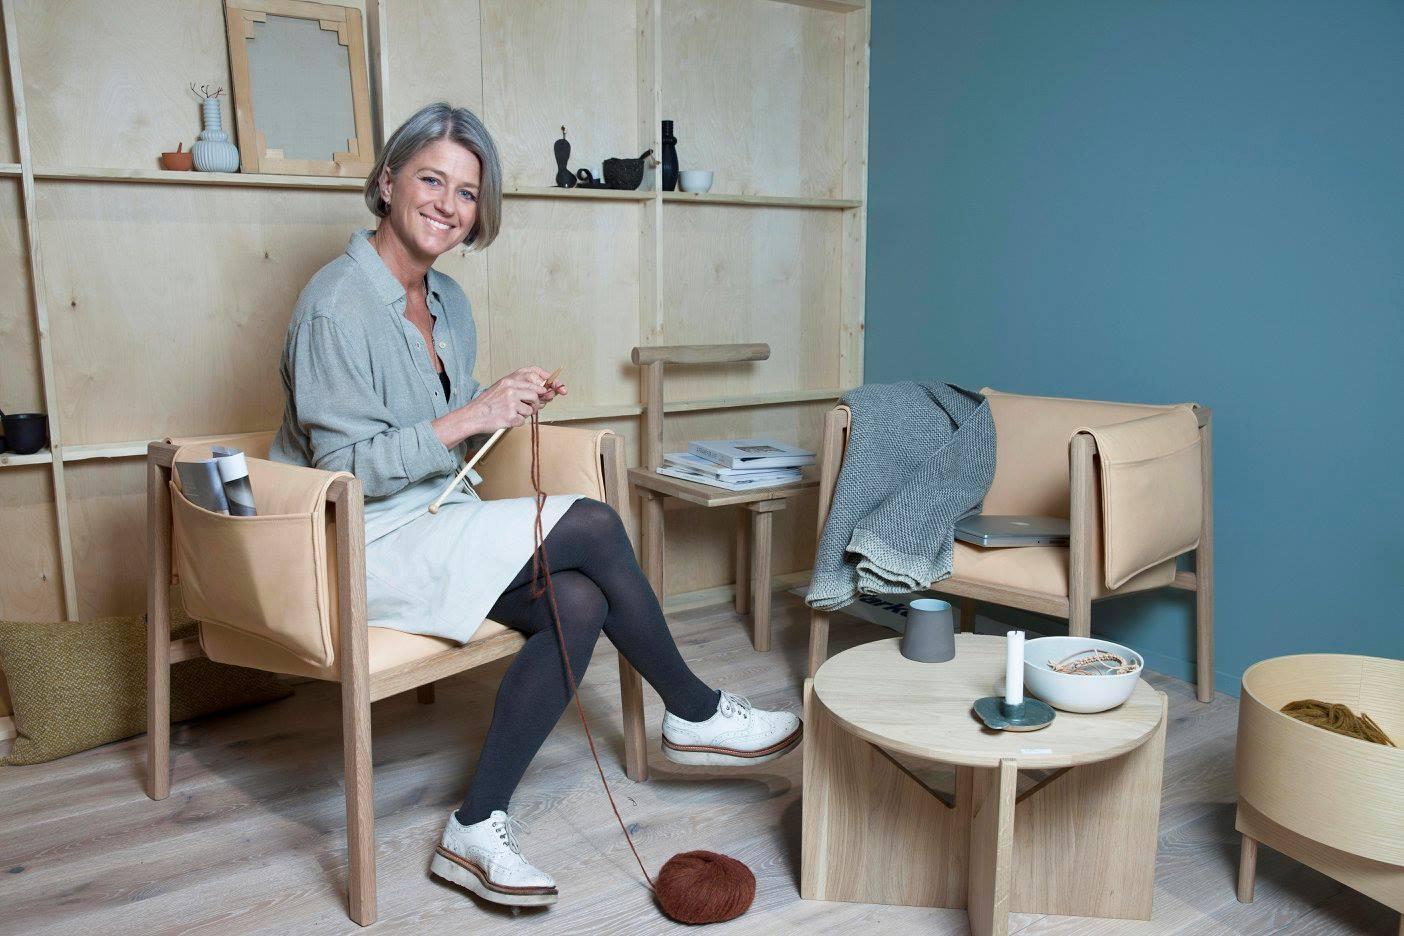 Hamskiftet: fra shabby chic til designfestival - Intervju for Tidsskriftet Kunsthåndverk, nr. 2 - 2016